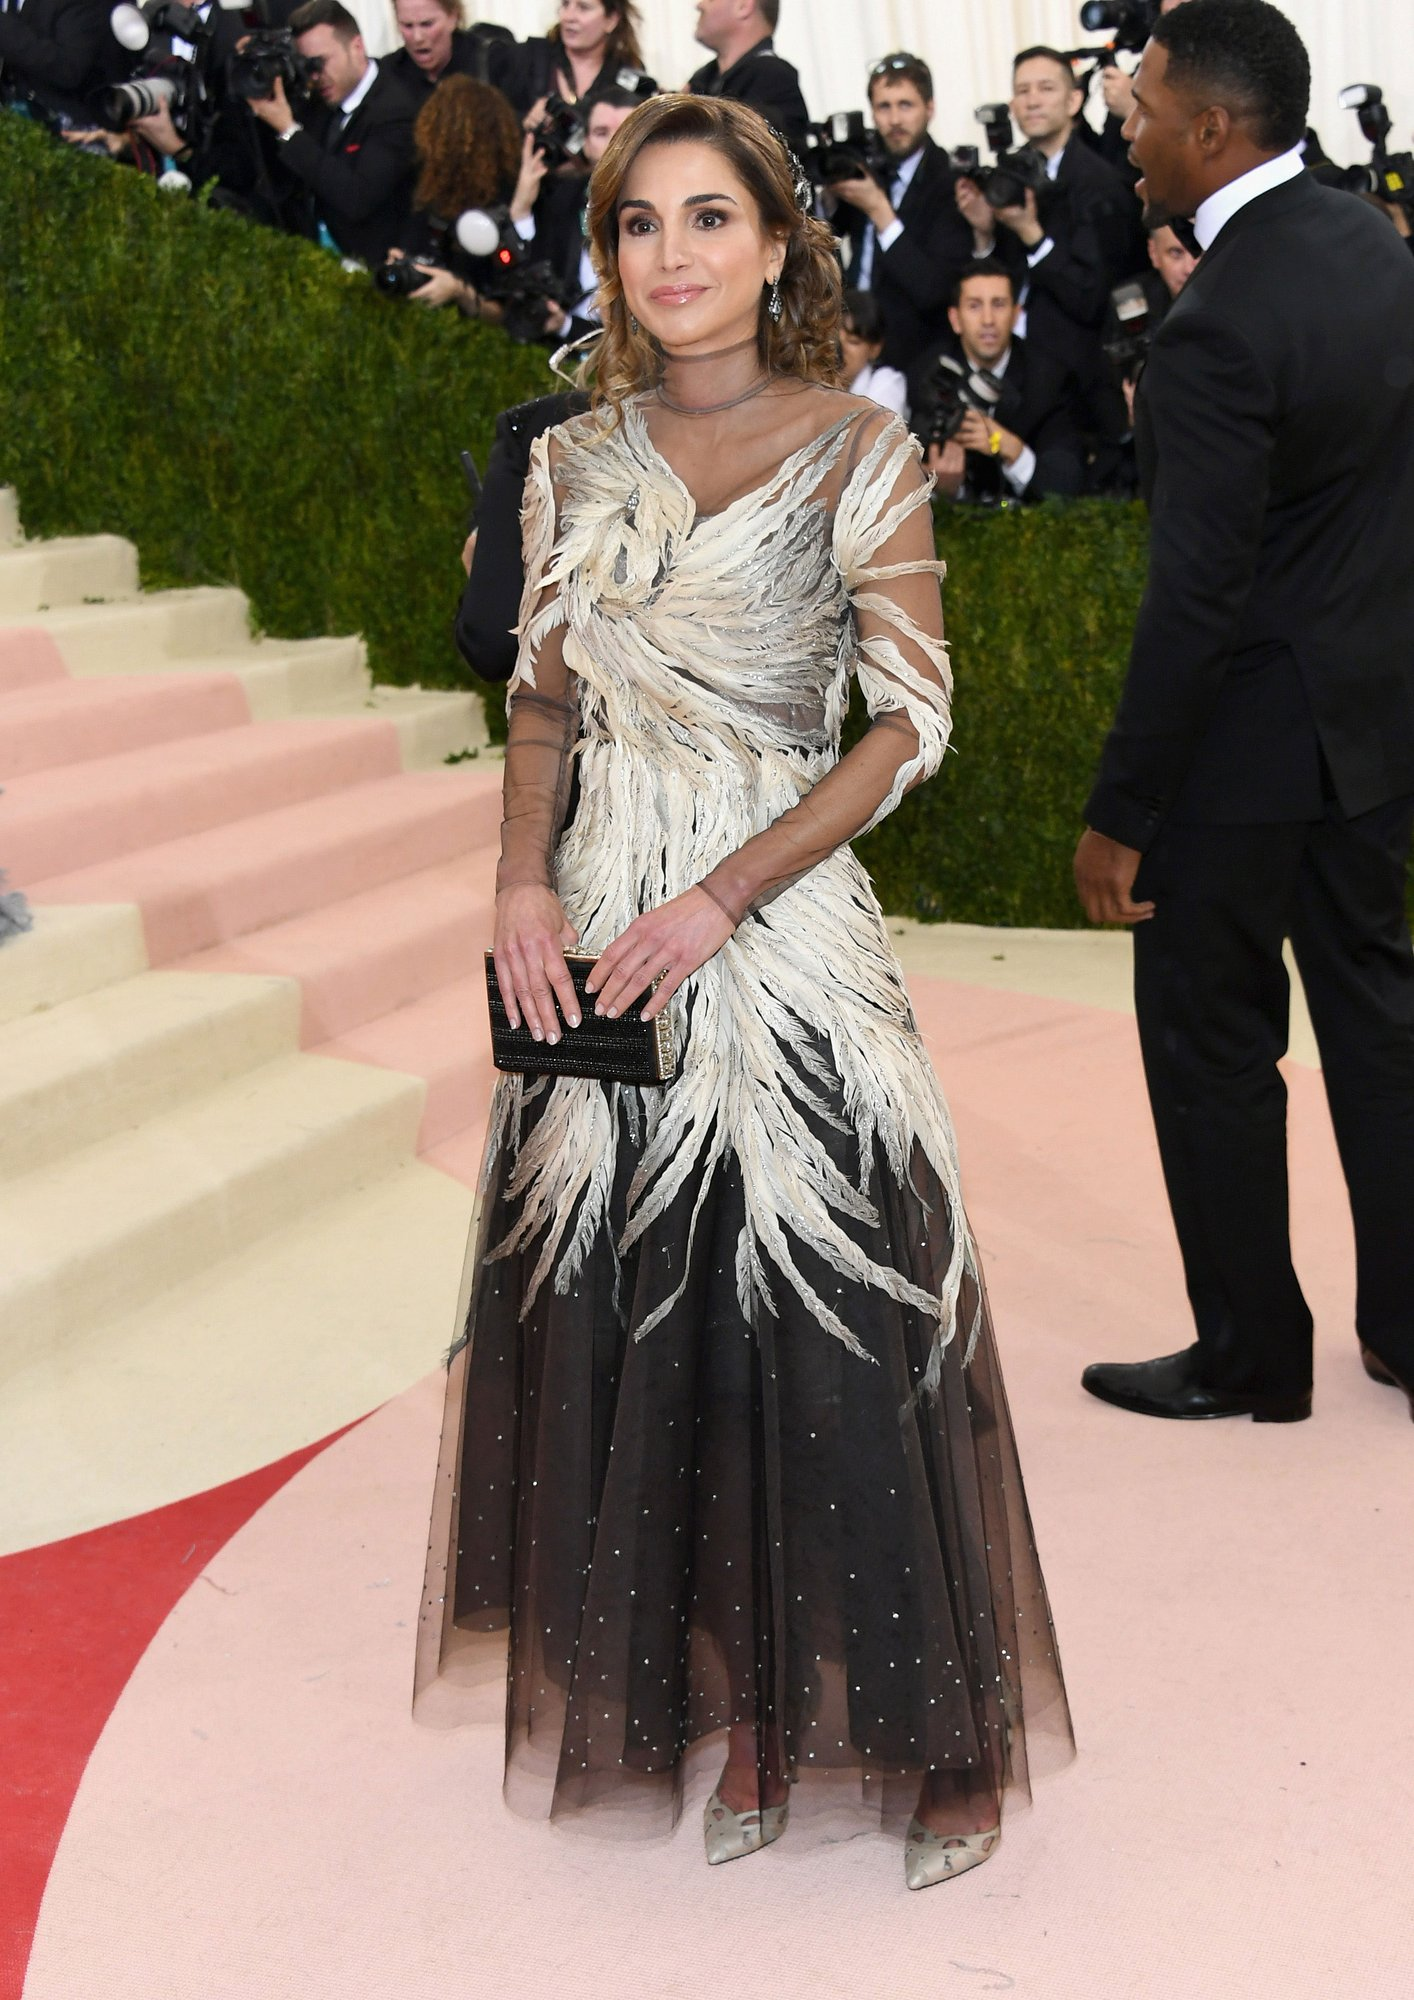 Queen Raina of Jordan in Valentino